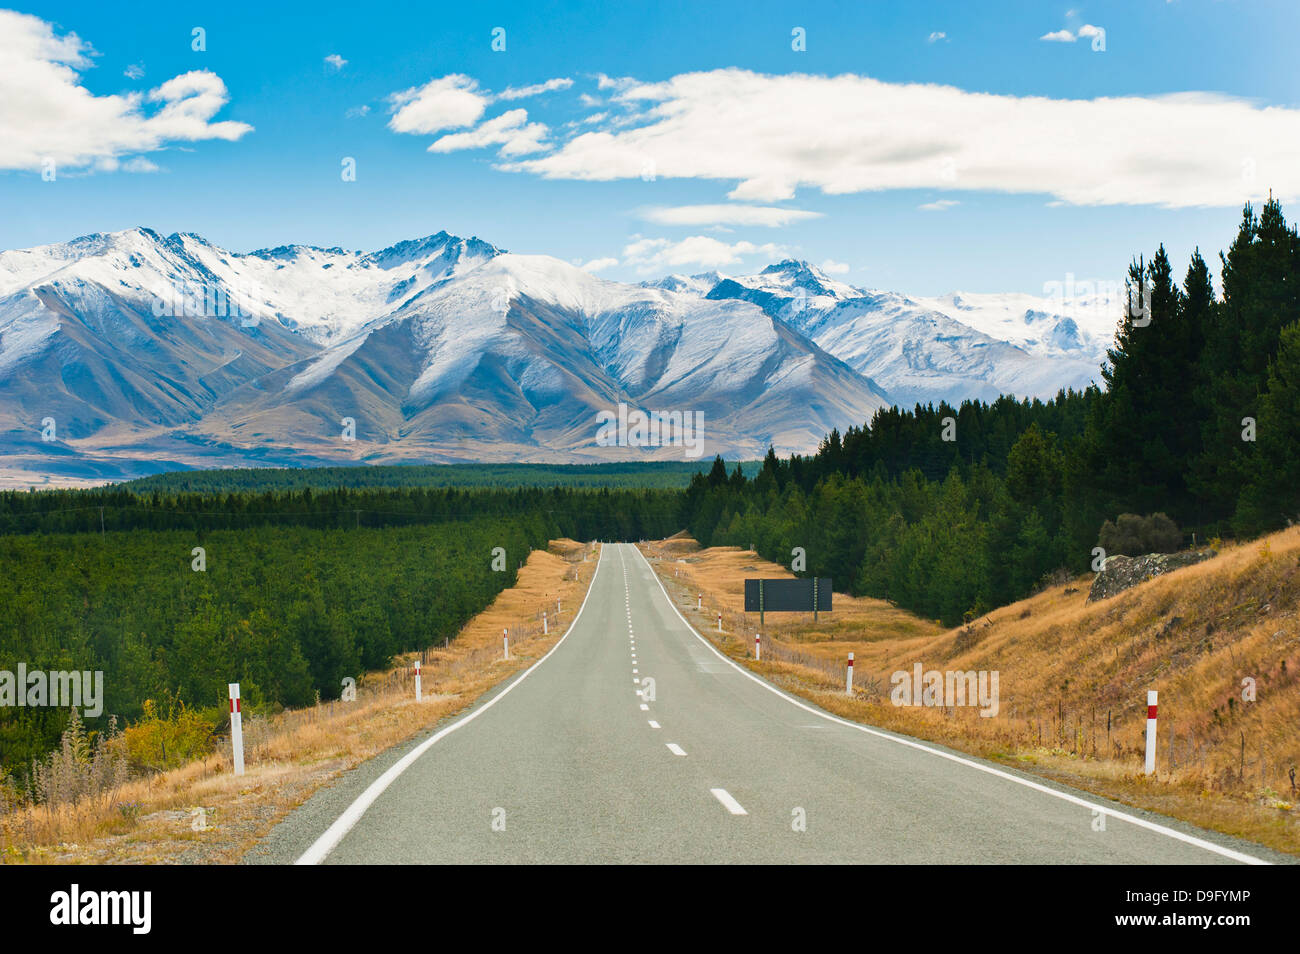 Road to Aoraki Mount Cook in Aoraki Mount Cook National Park, UNESCO World Heritage Site, South Island, New Zealand - Stock Image